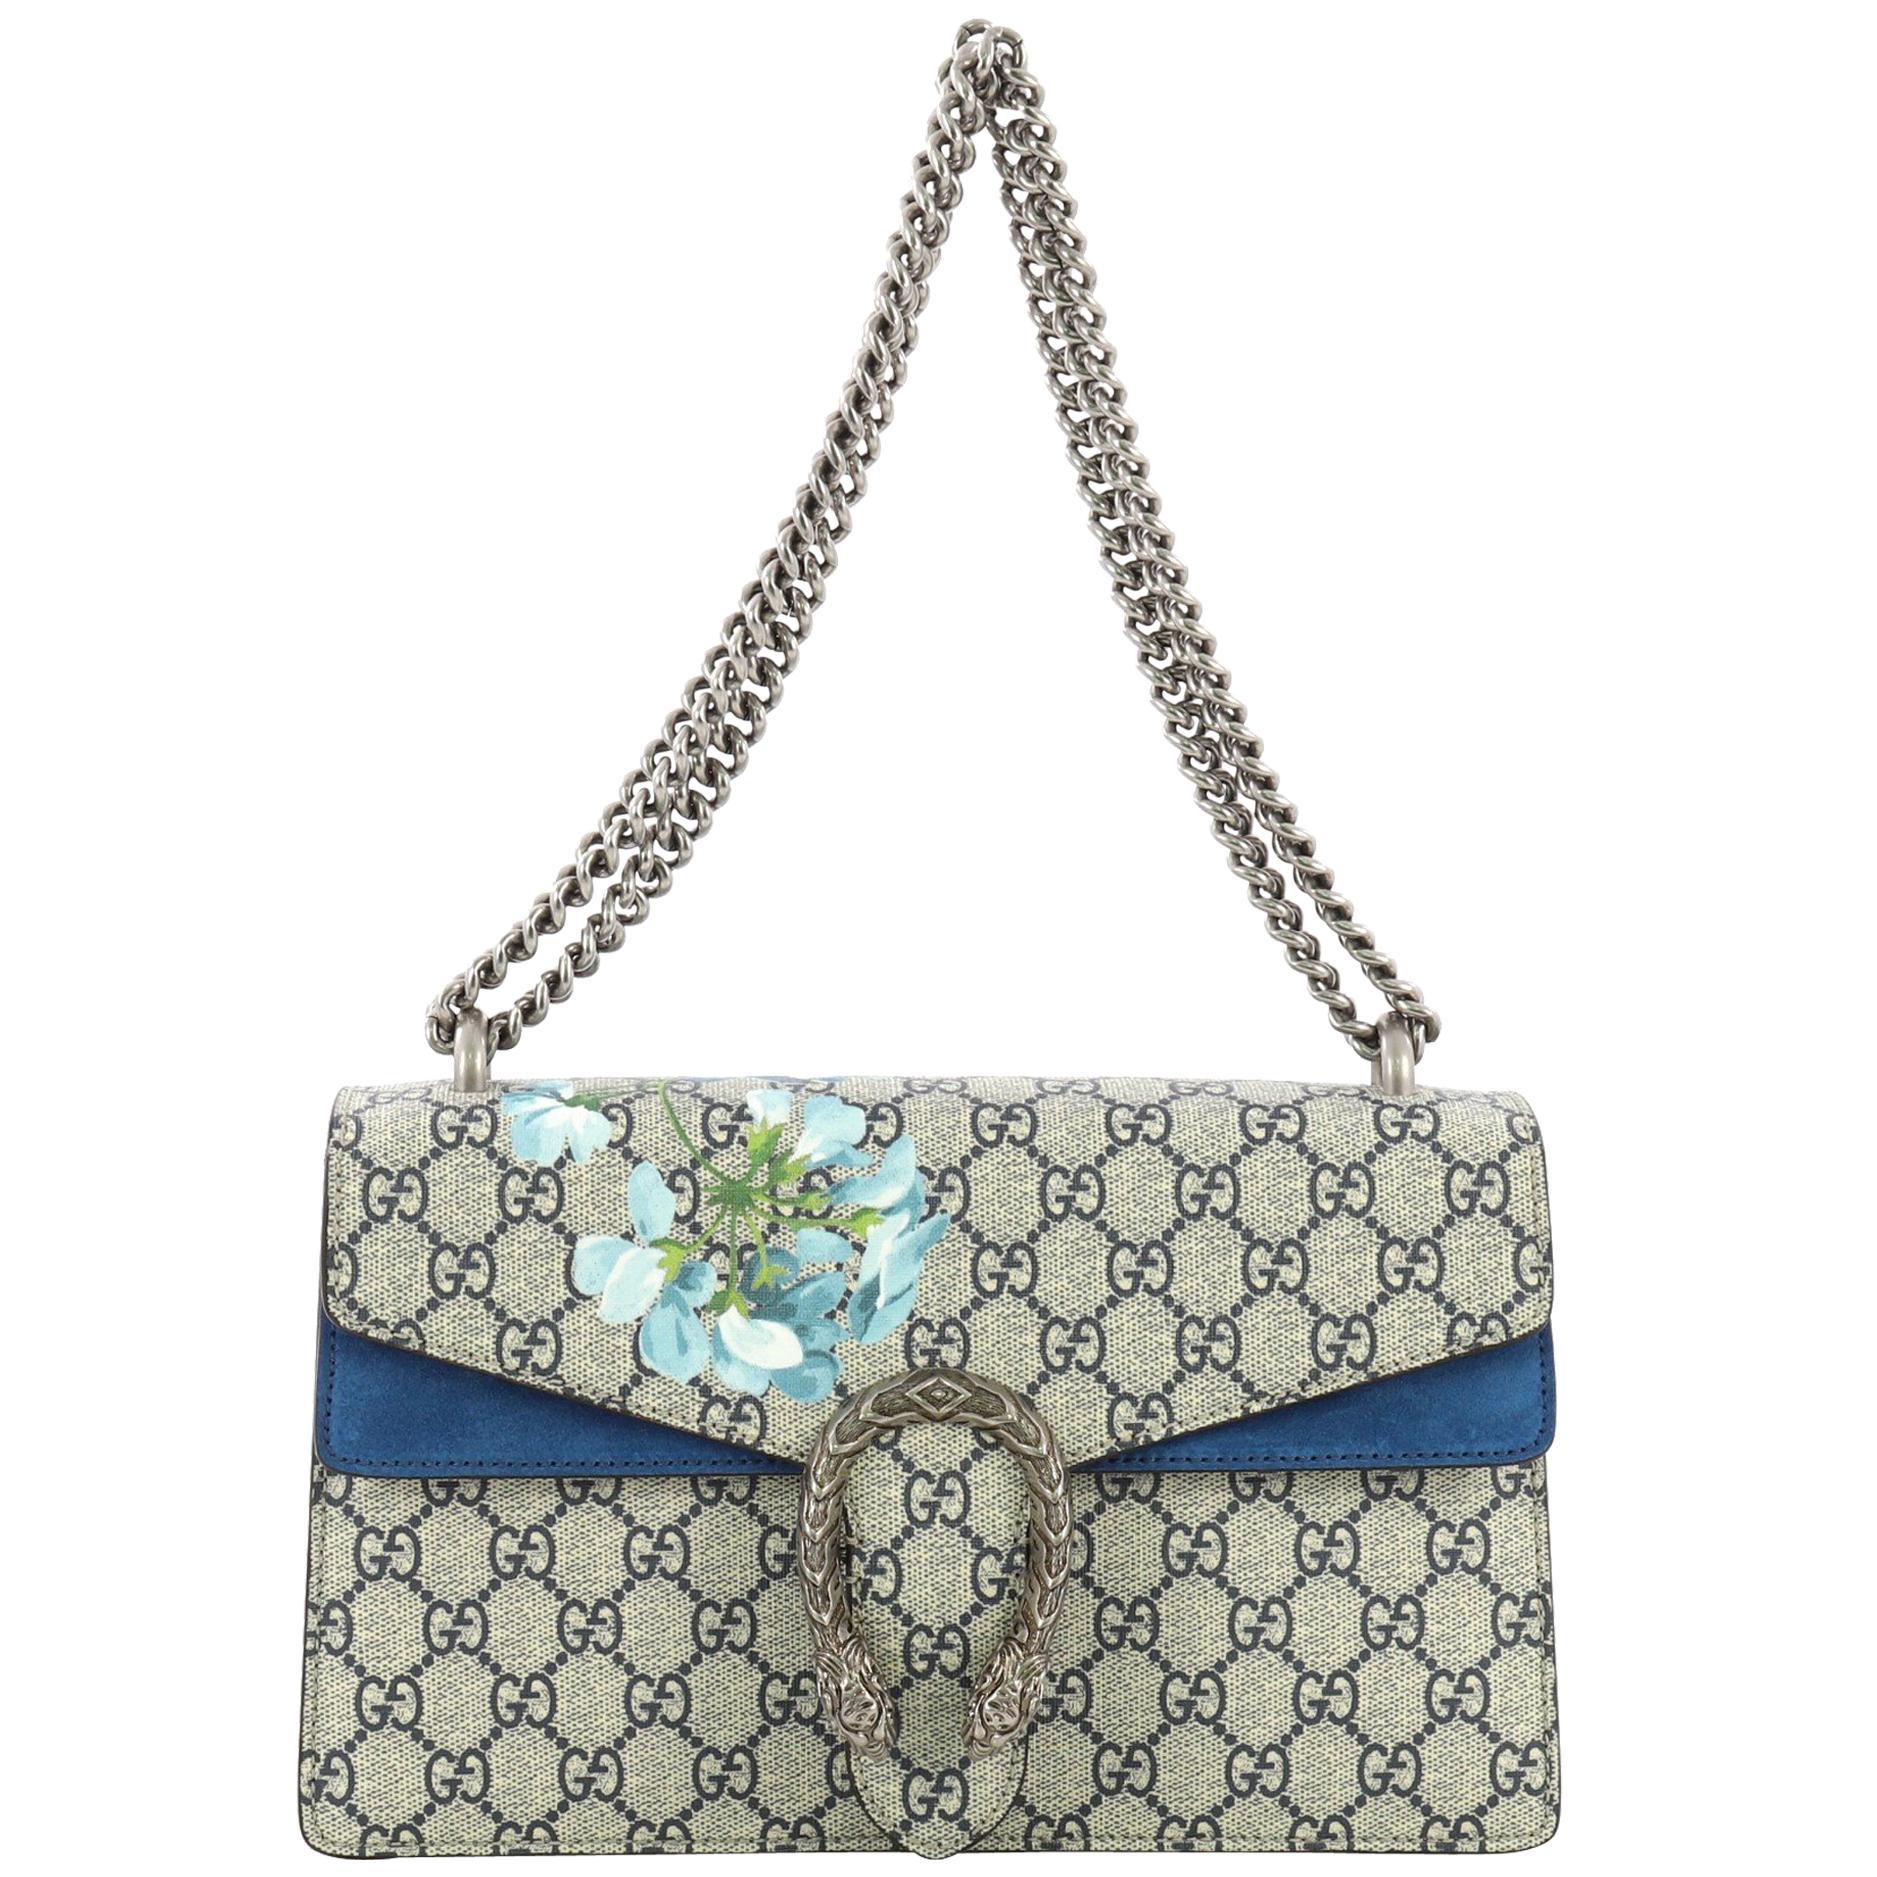 40a001c8a9c79e Gucci Dionysus Handbag Blooms Print GG Coated Canvas Small at 1stdibs